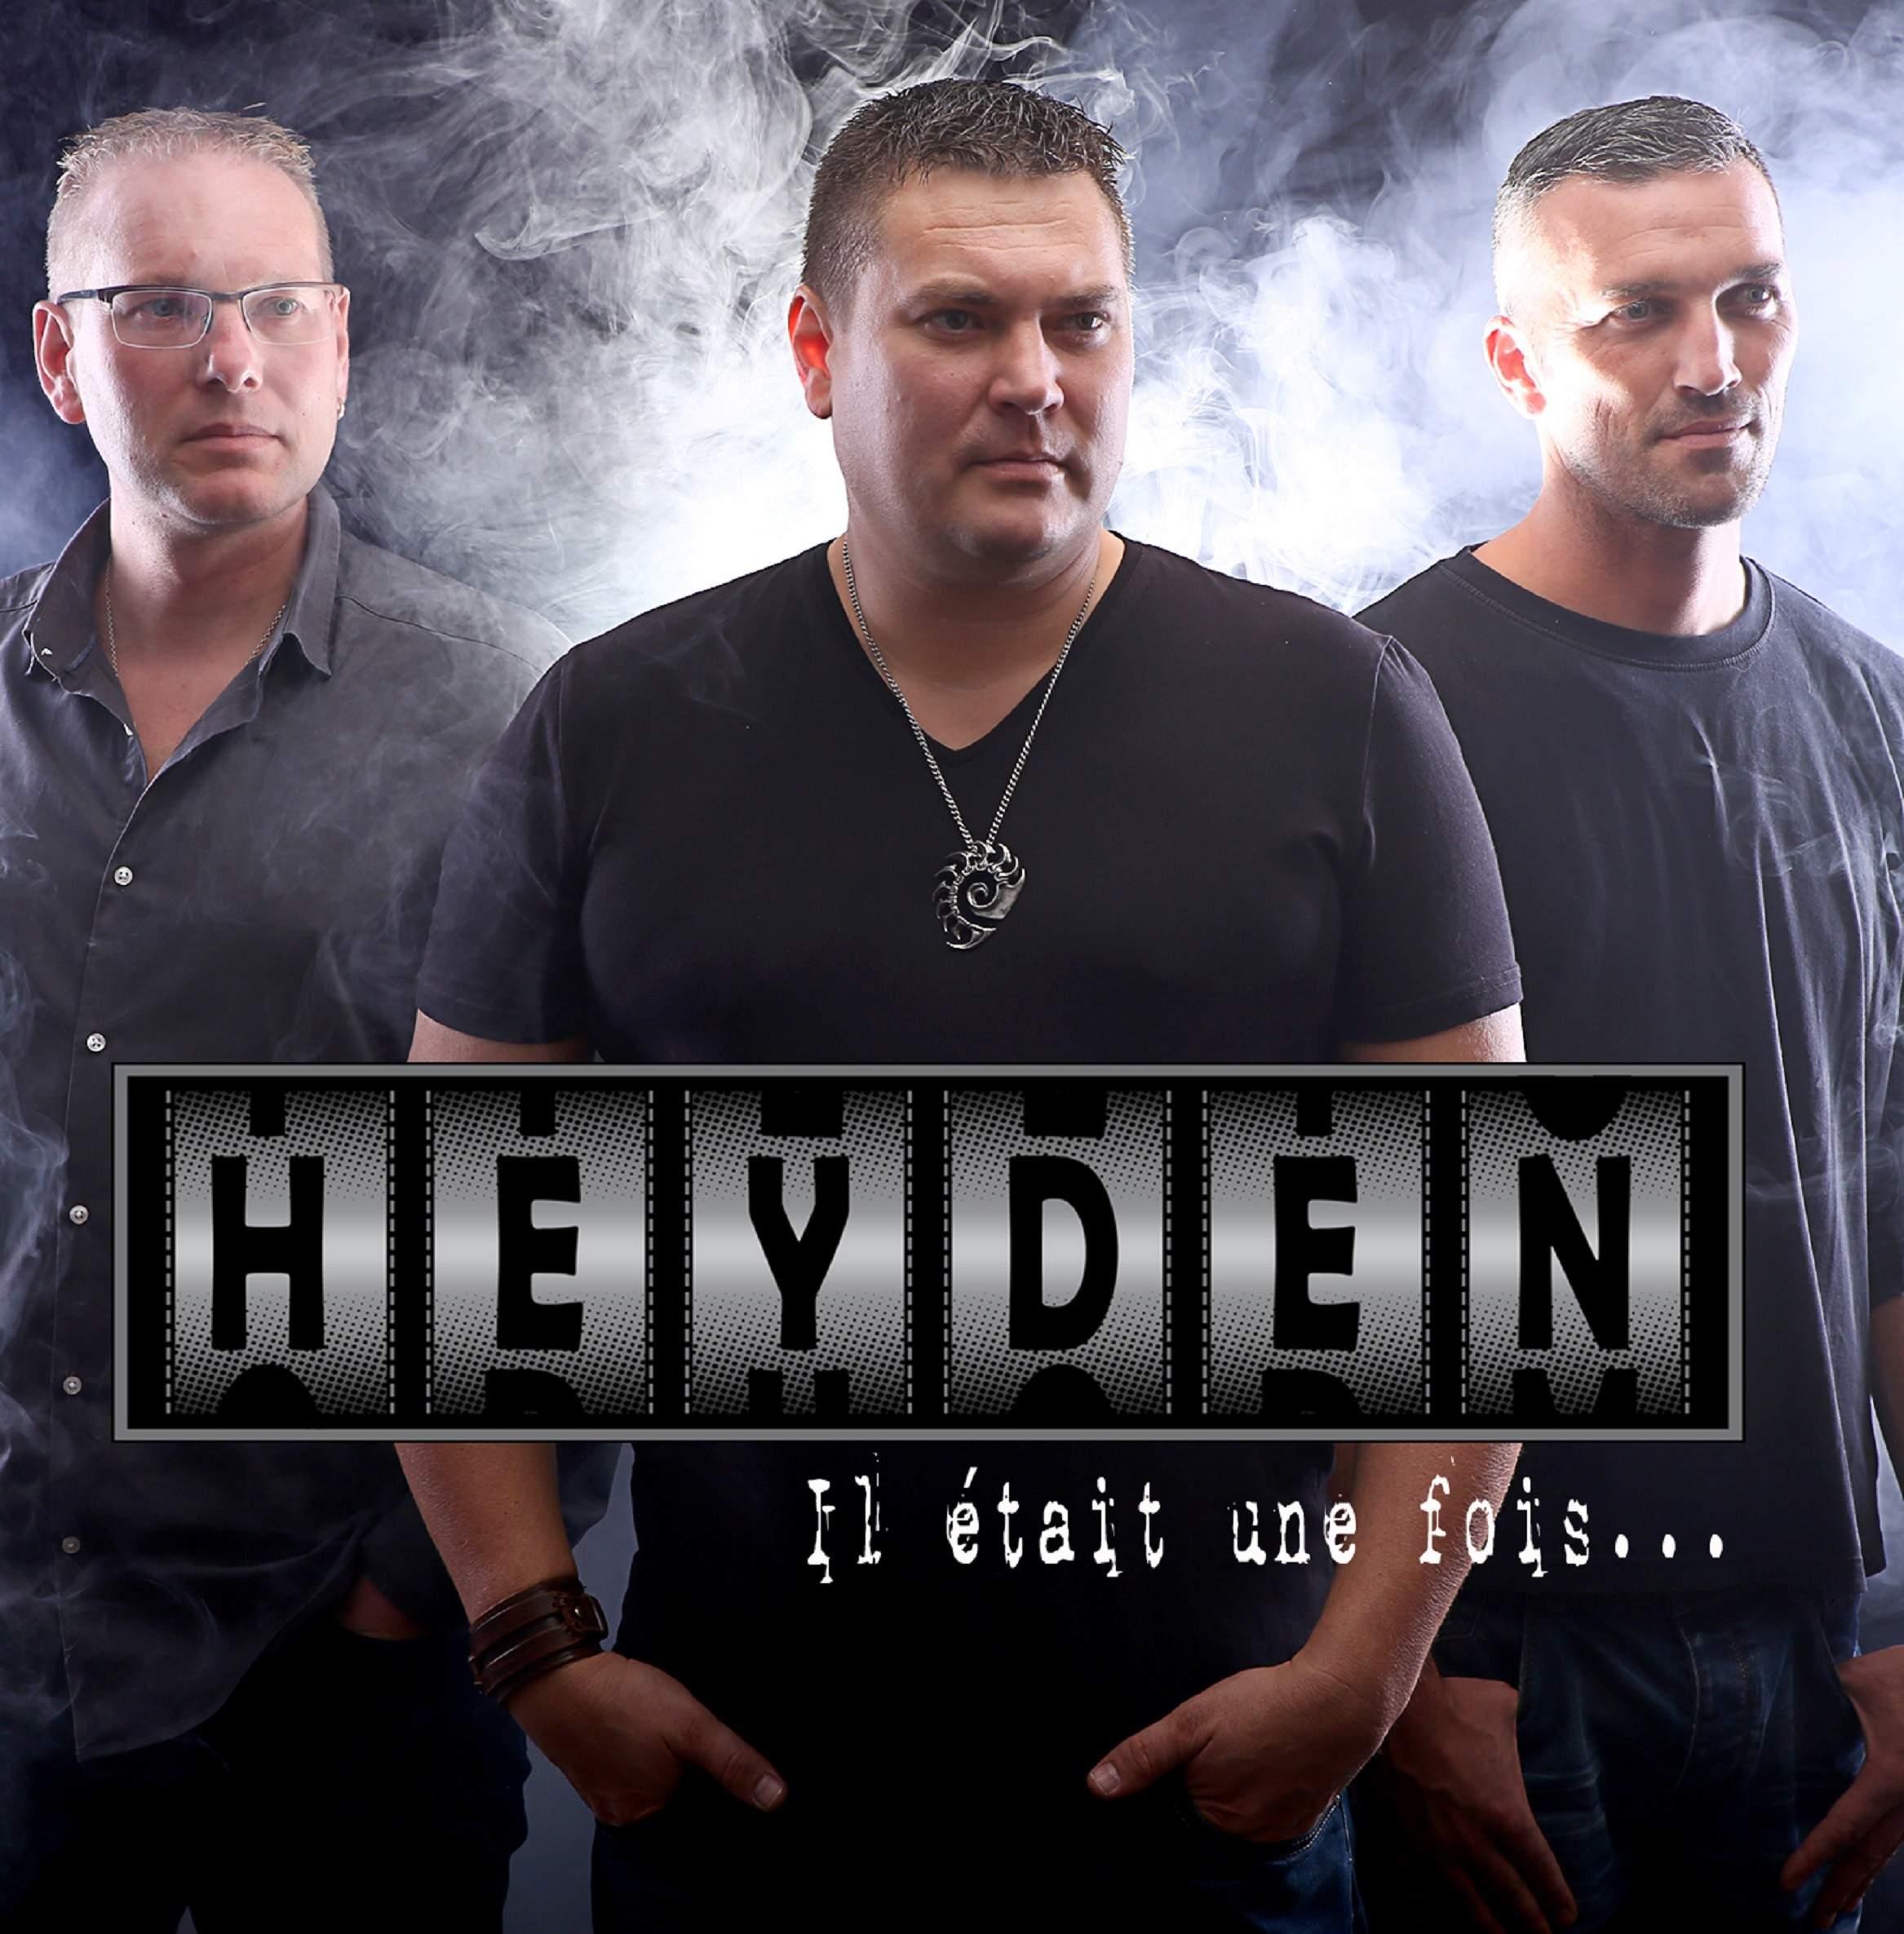 HEYDEN  - POP ROCK